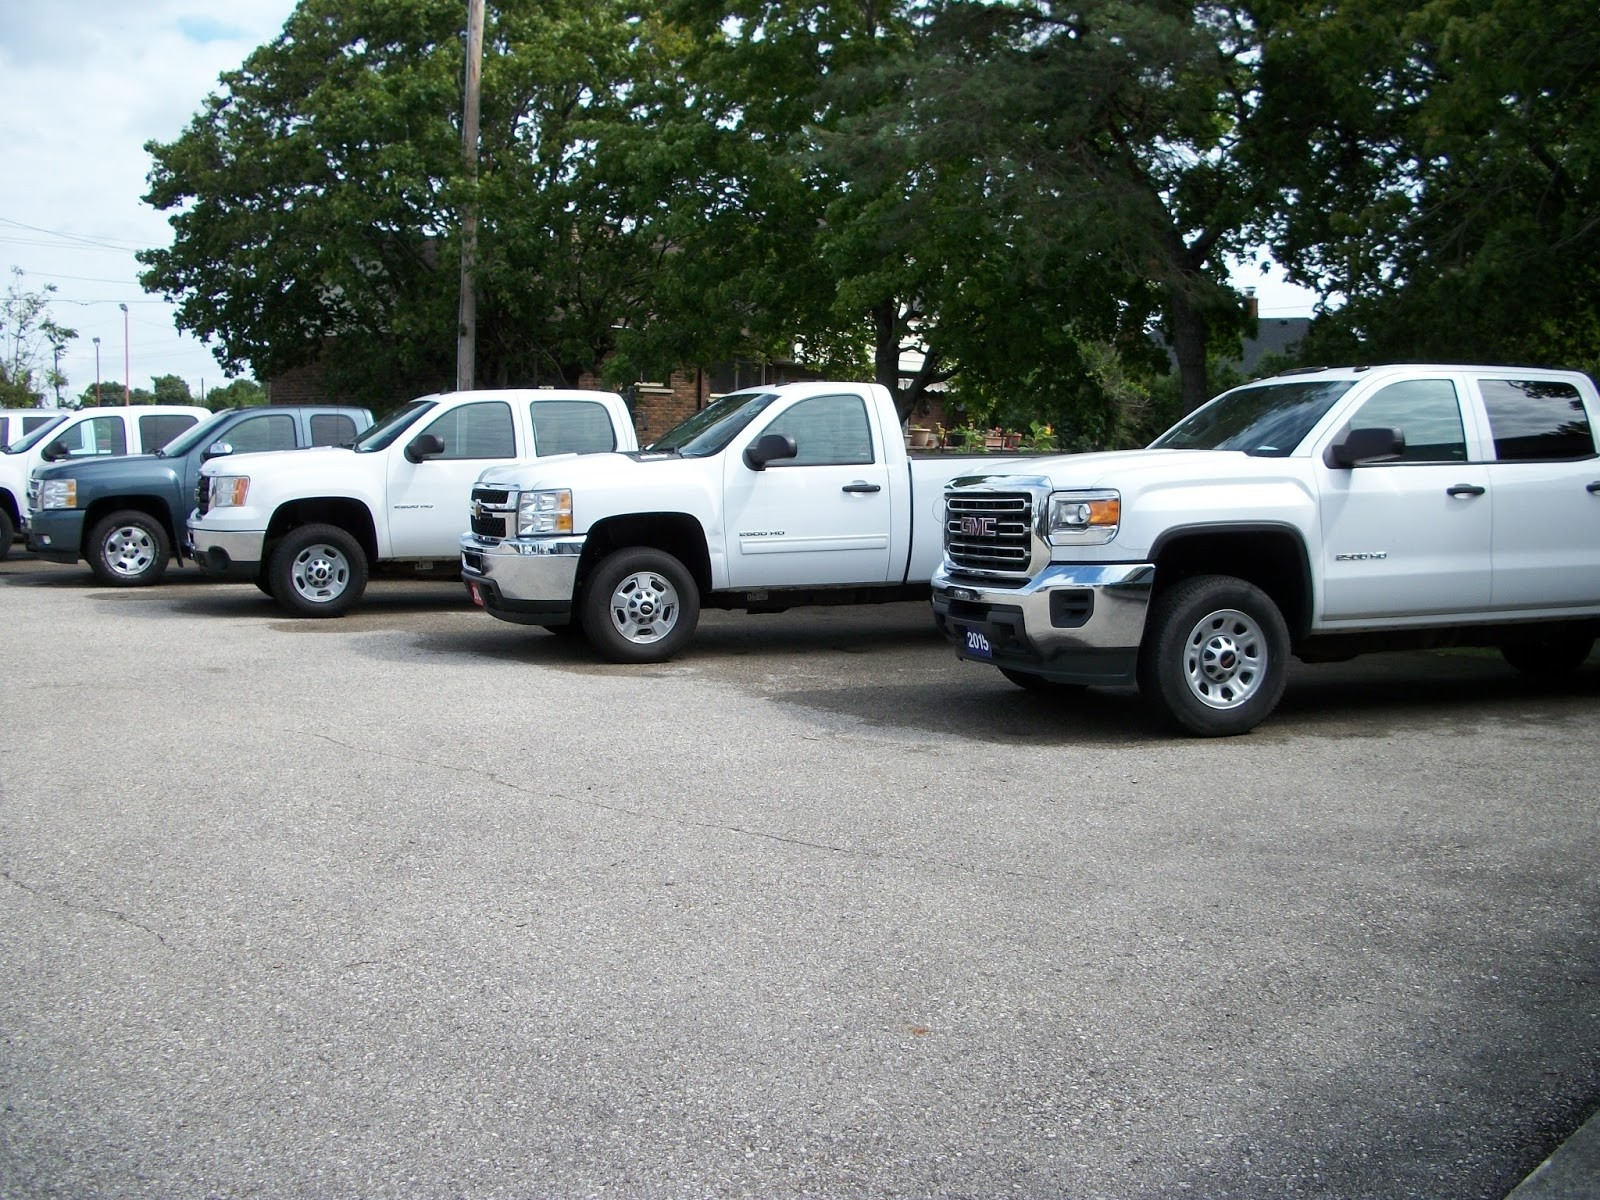 Used pickup trucks Driver's Auto Mart